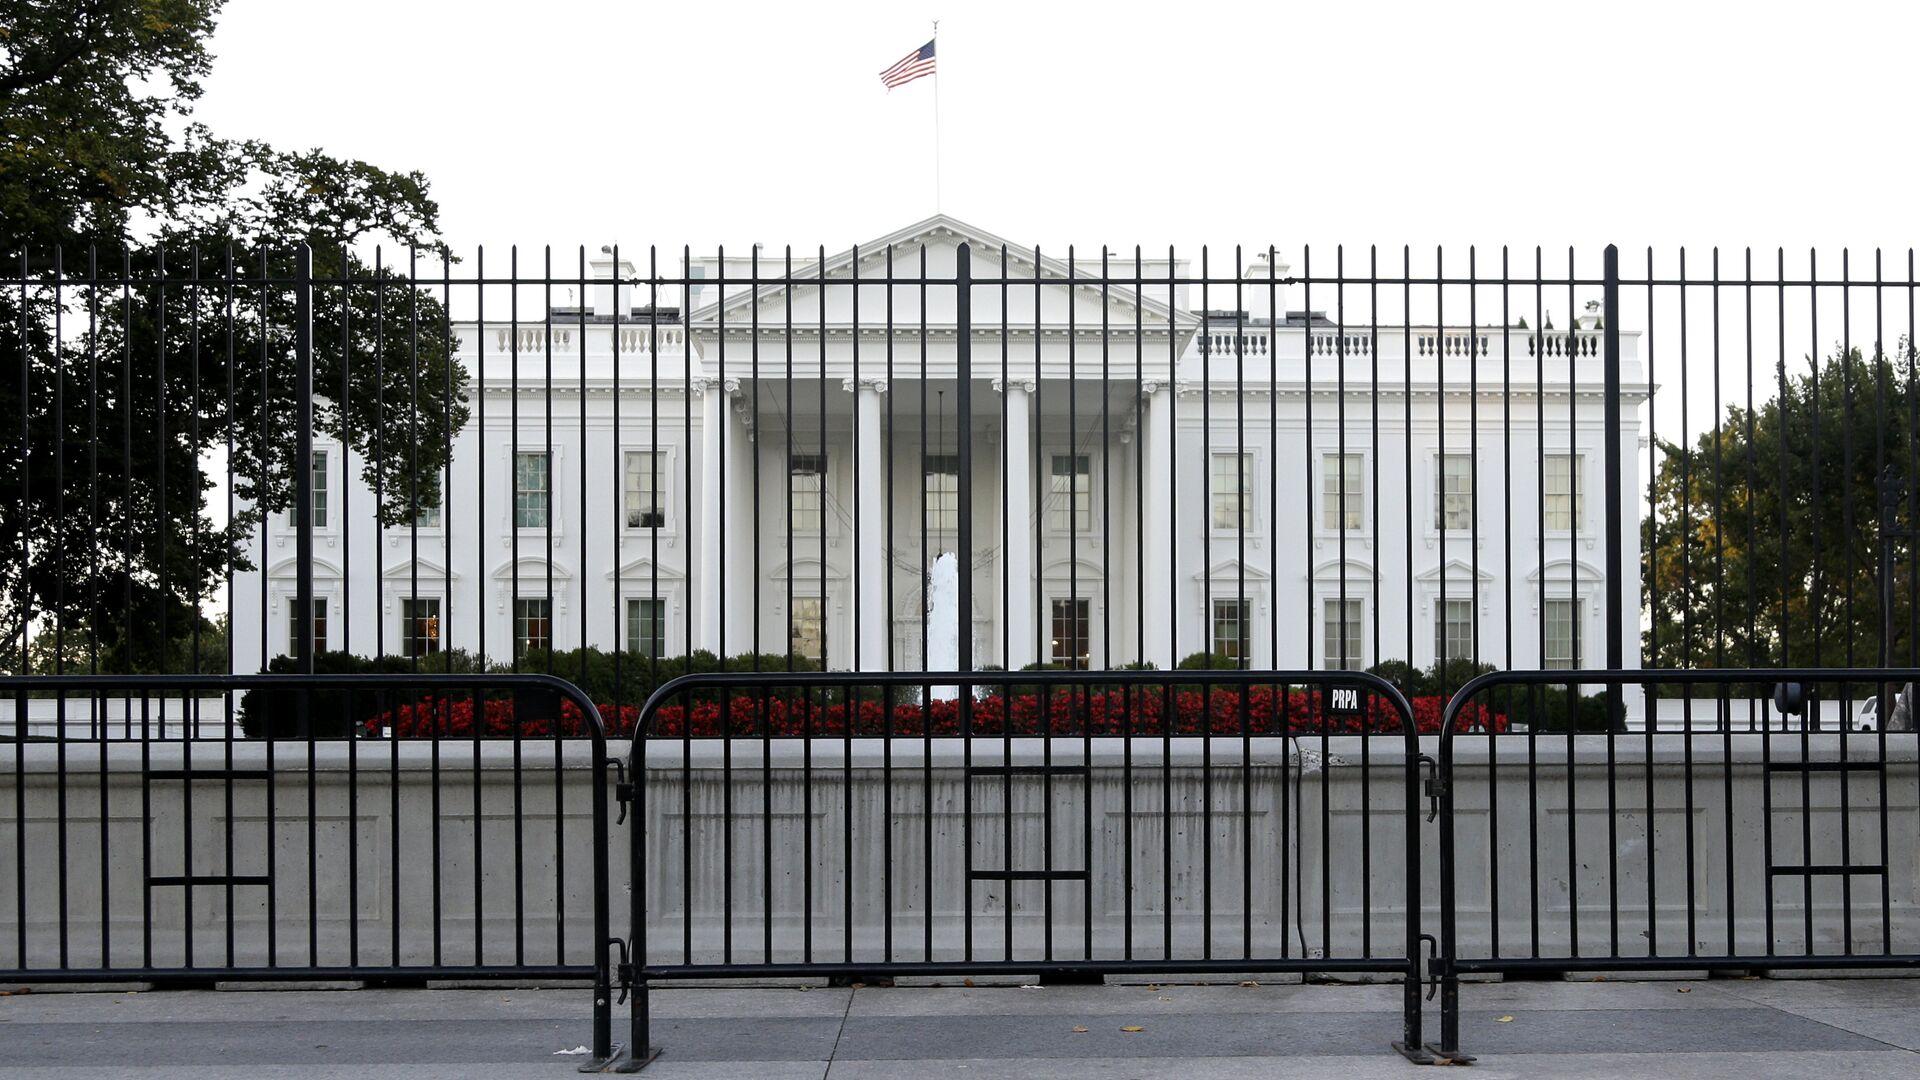 The White House is viewed from Pennsylvania Avenue in Washington. - Sputnik Česká republika, 1920, 27.07.2021